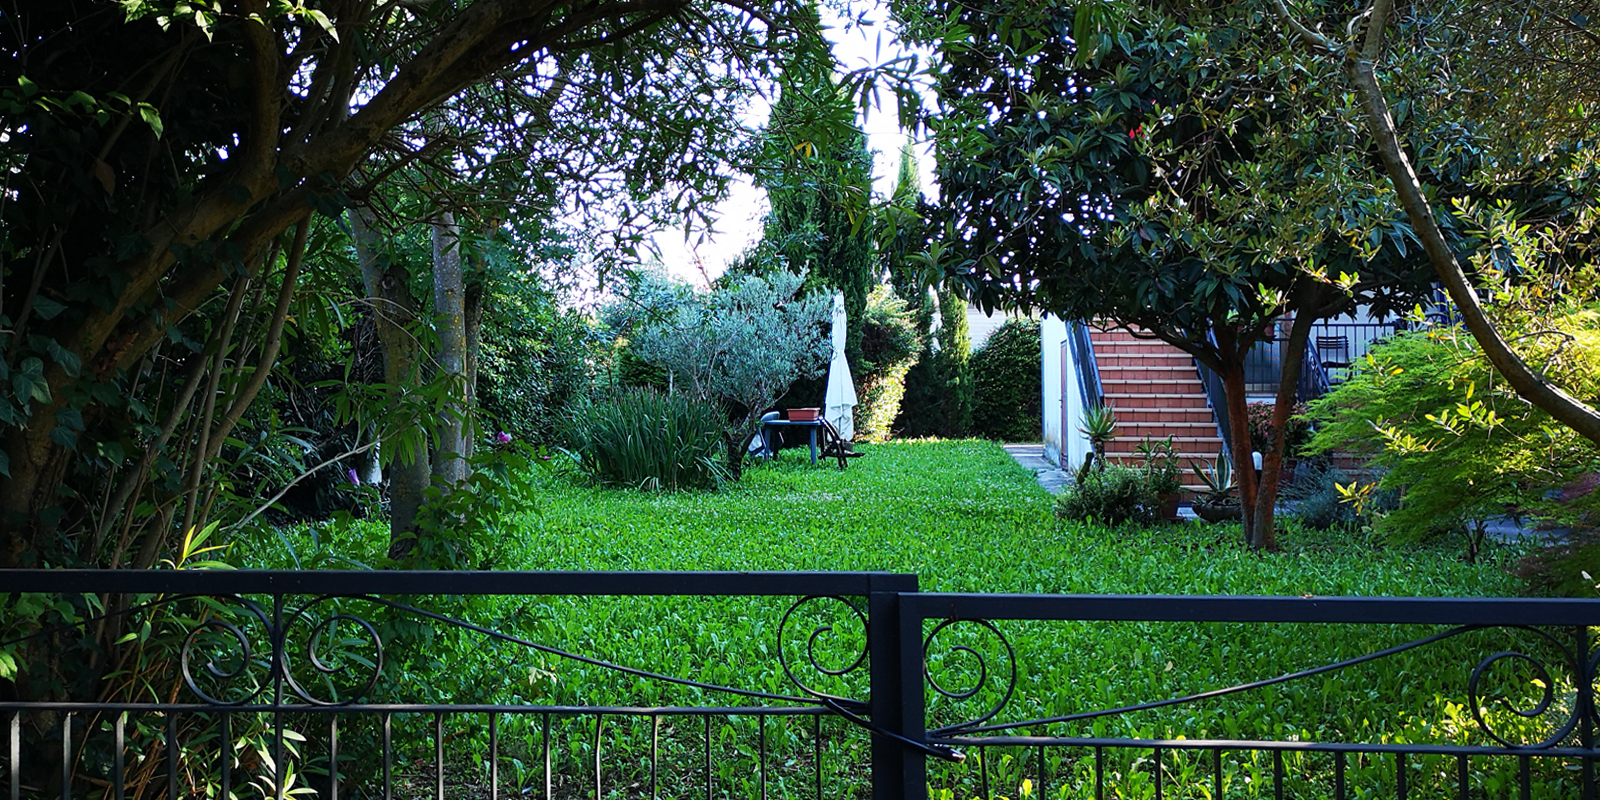 giardino isadora duncan